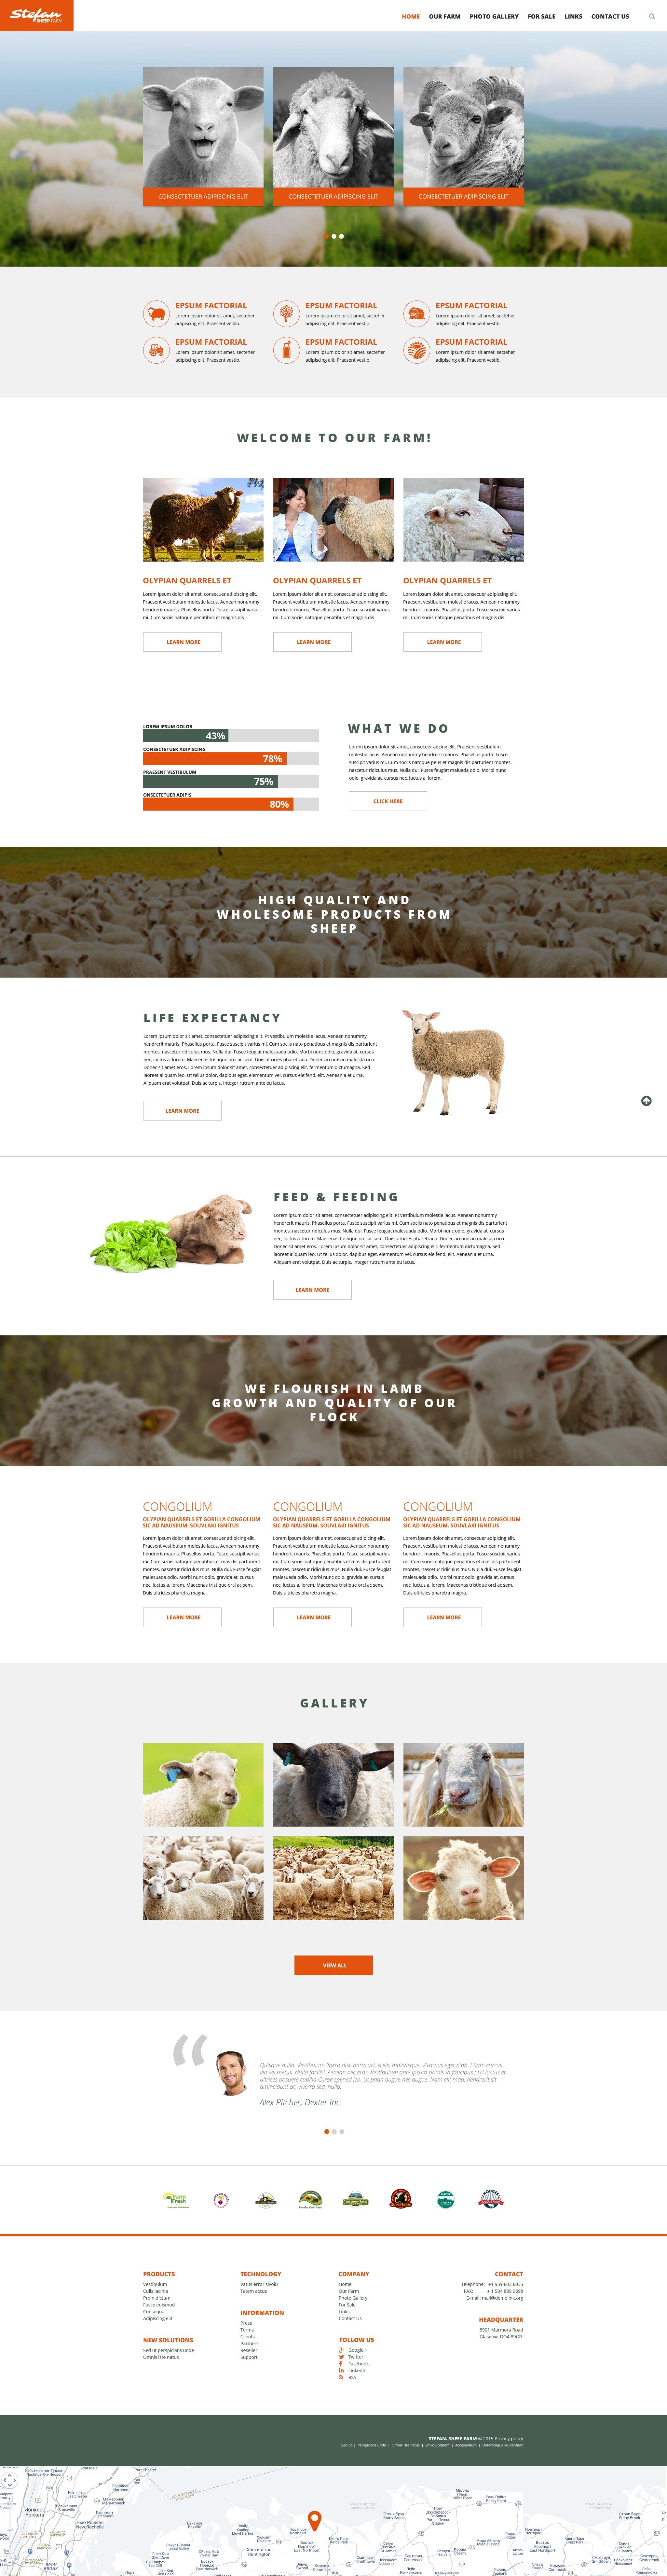 Sheep Farm Website Template